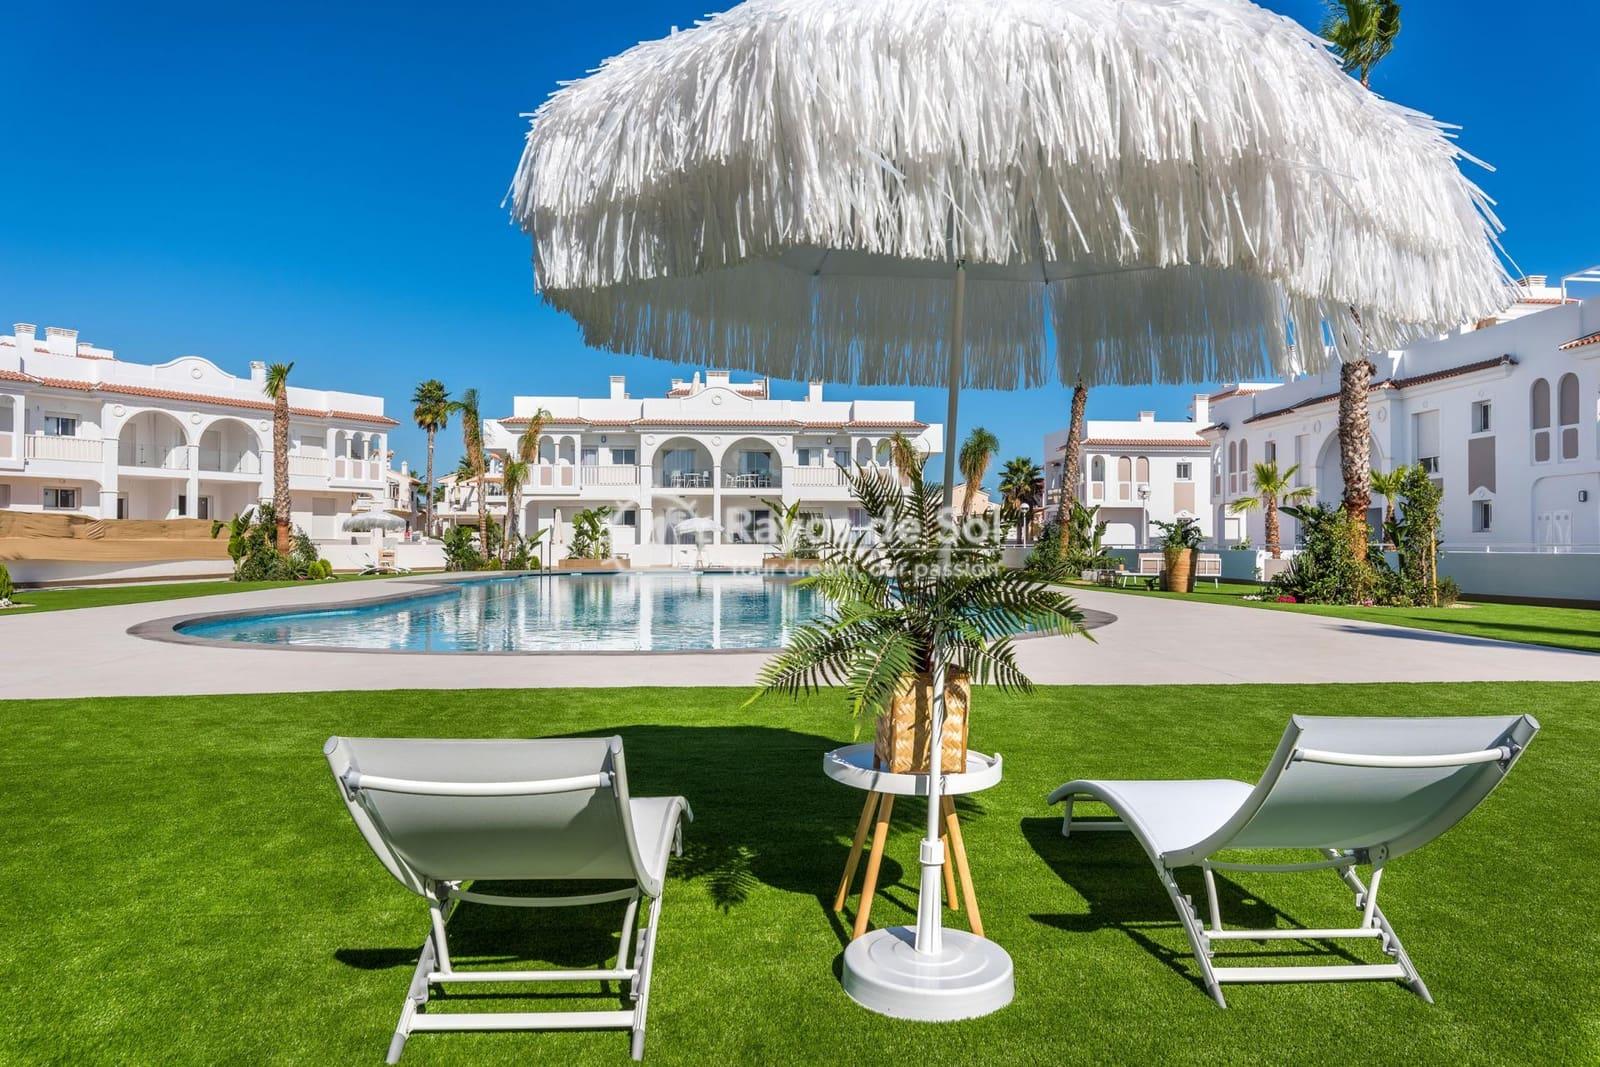 2 bedroom Apartment for sale in Ciudad Quesada with pool - € 204,000 (Ref: 3917099)